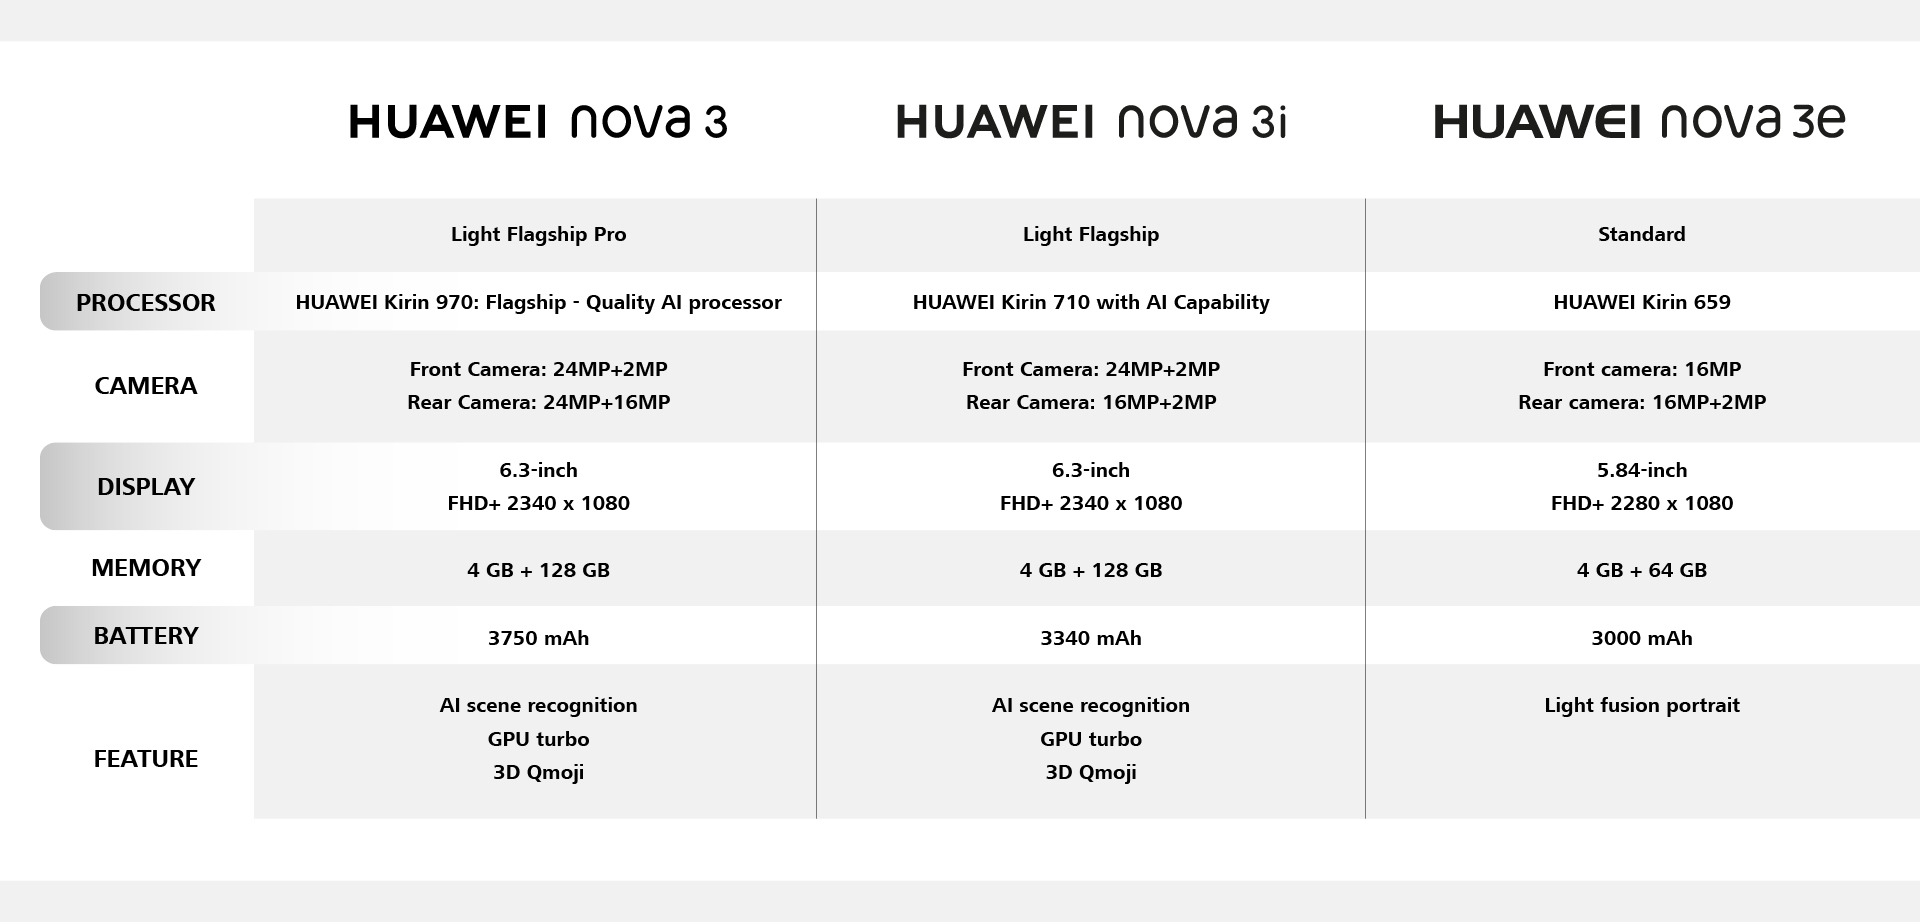 new concept 87ce6 cf8c7 HUAWEI Nova 3i, Best AI Camera Android Smartphone | HUAWEI UAE